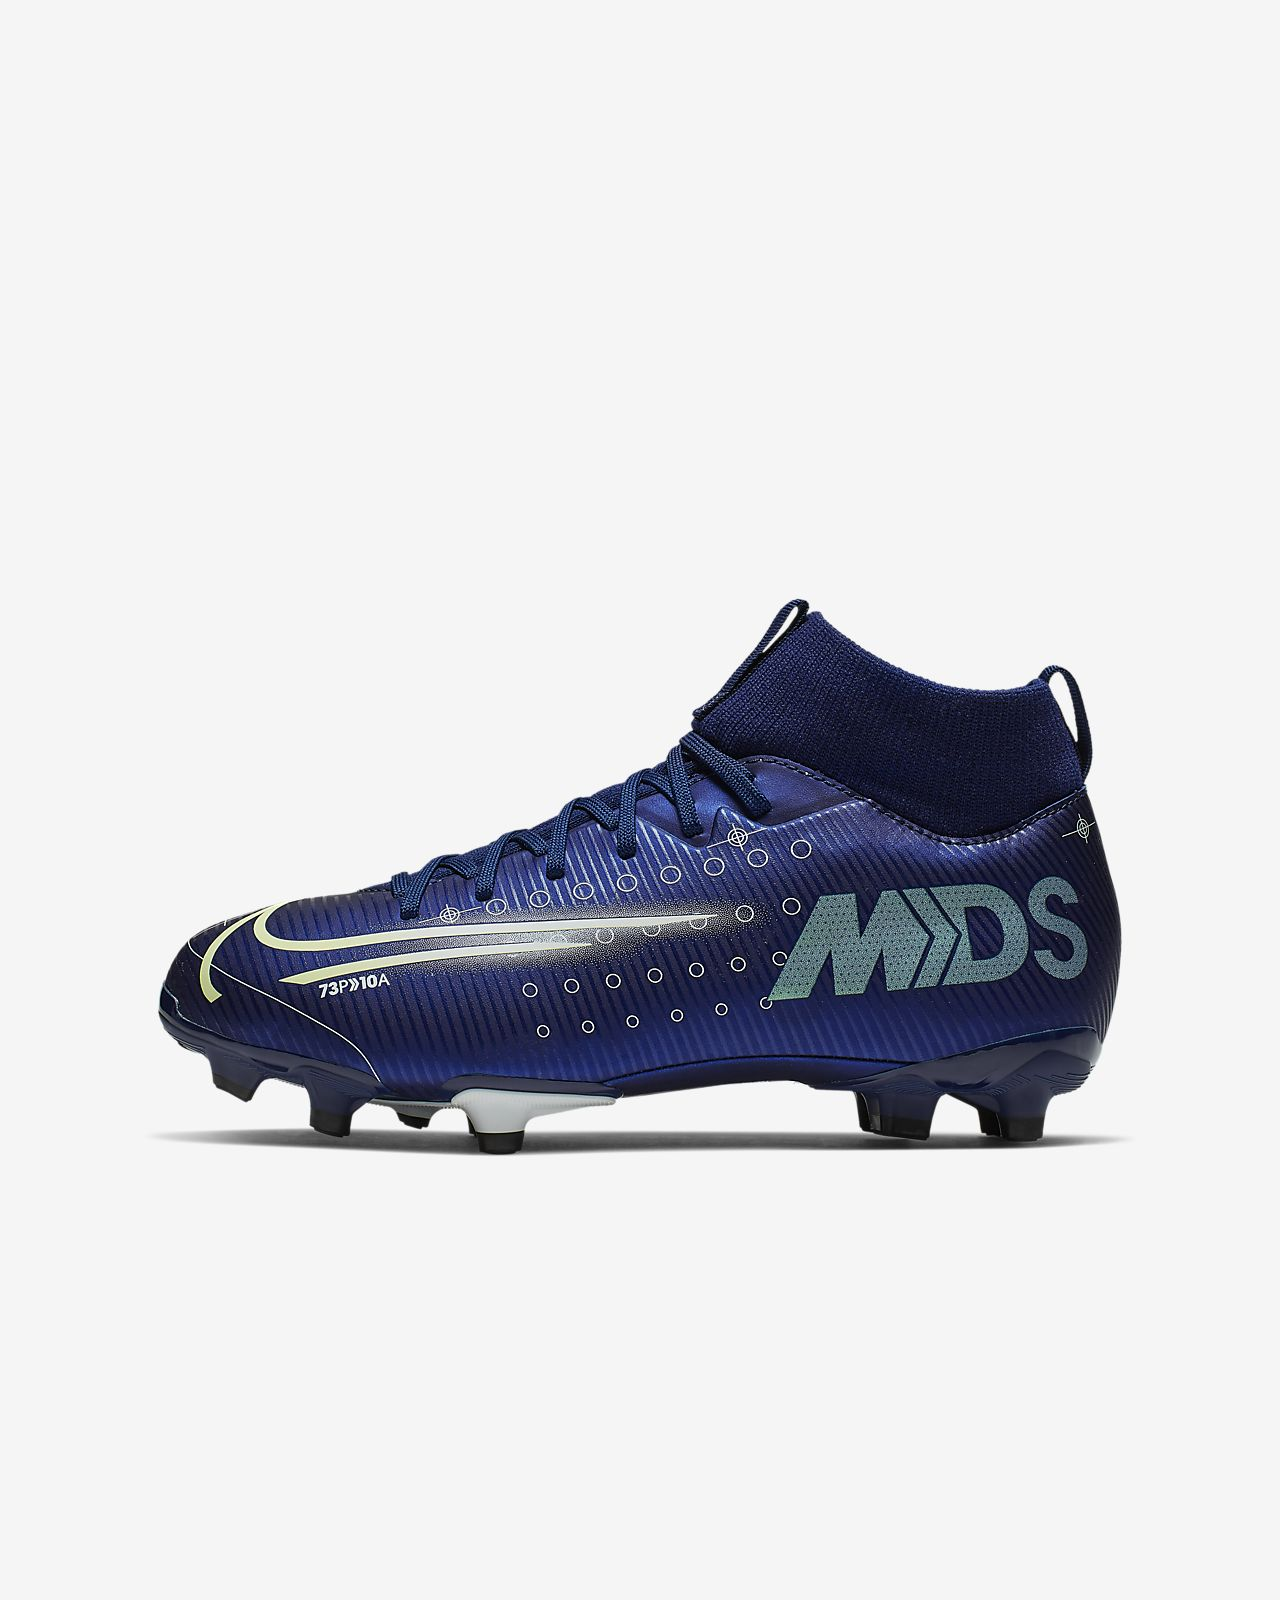 Scarpa da calcio multiterreno Nike Jr. Mercurial Superfly 7 Academy MDS MG - Bambini/Ragazzi